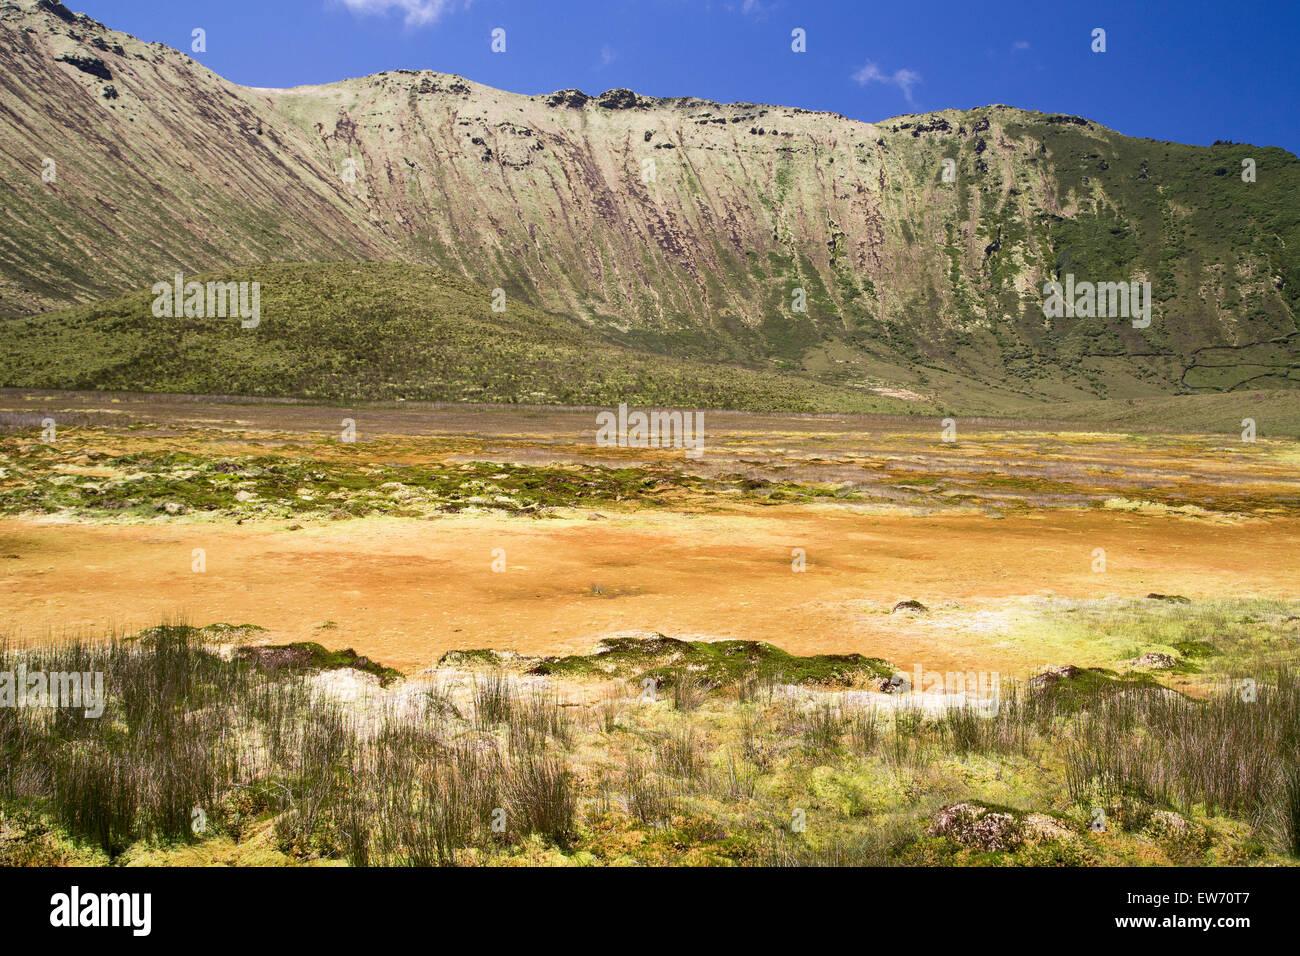 Landschaft, genommen in den Vulkankrater Corvo Insel auf den Azoren, portugal Stockbild